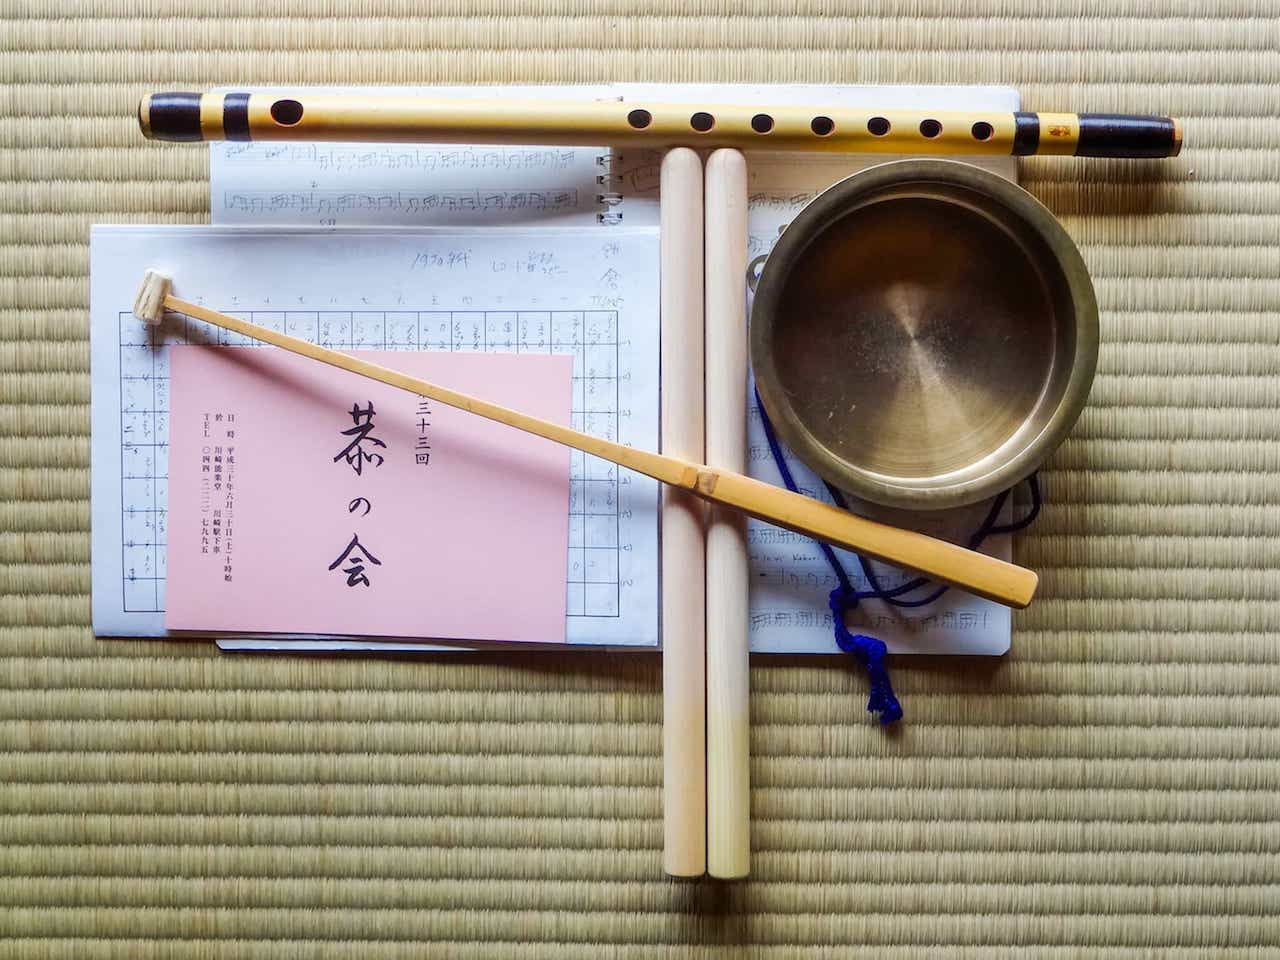 Edo Bayashi practice materials during my 2-week Tokyo intensive